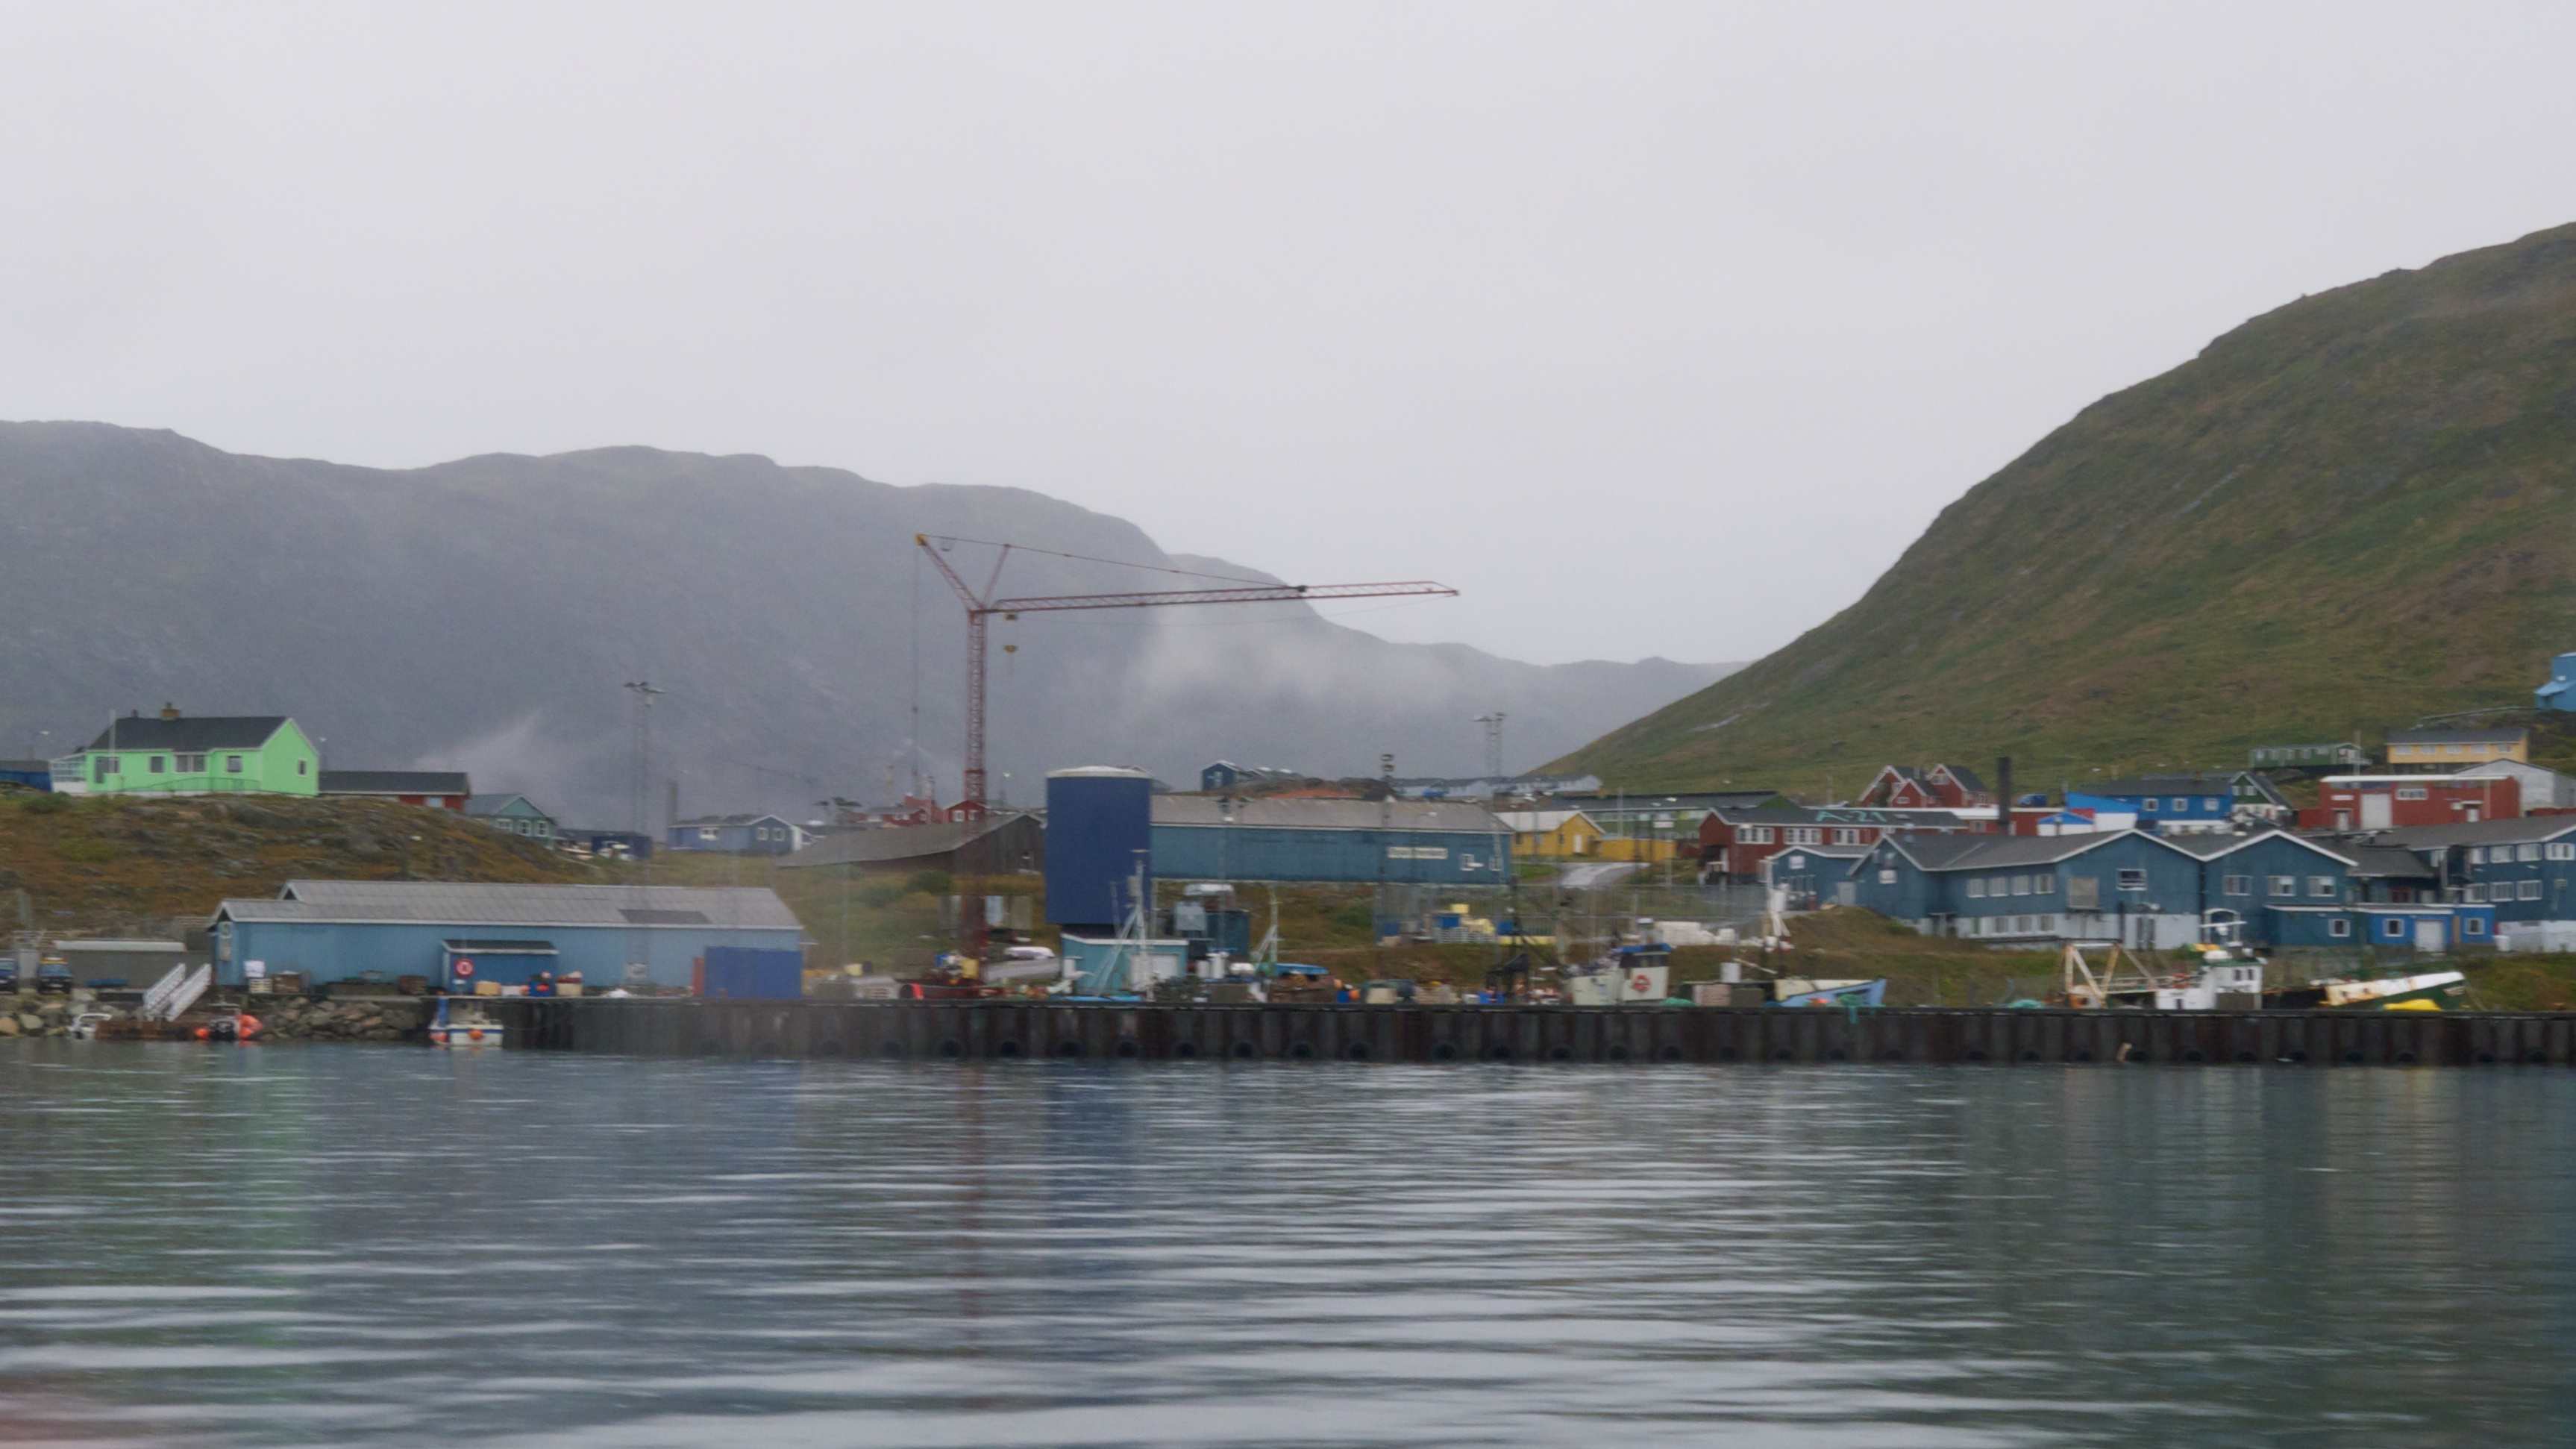 The port in Narsaq, Greenland, in 2011. (Claire Rowland / CC via Flickr)